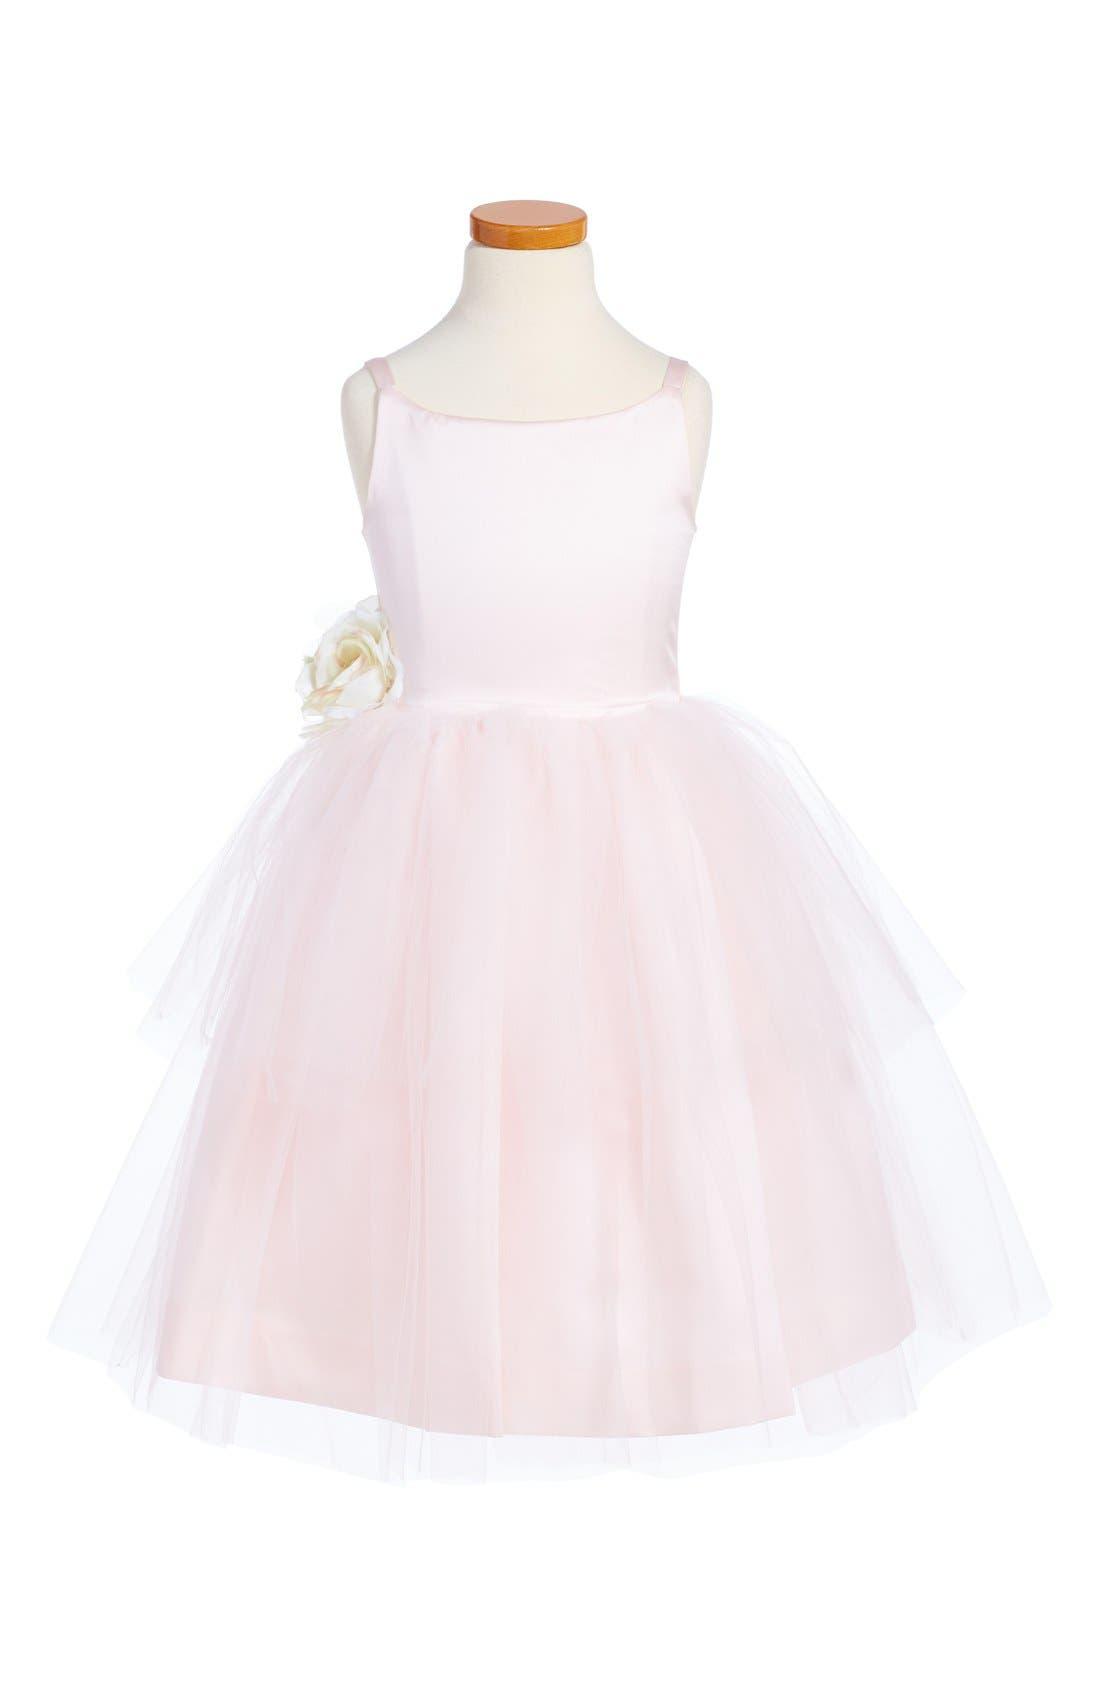 Tulle Ballerina Dress,                             Main thumbnail 1, color,                             BLUSH PINK